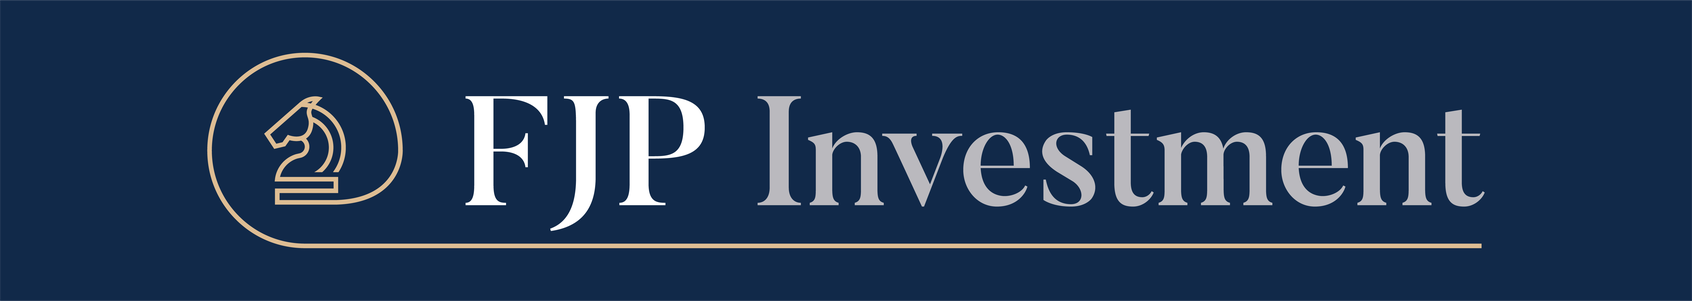 FJP Investment Ltd Logo